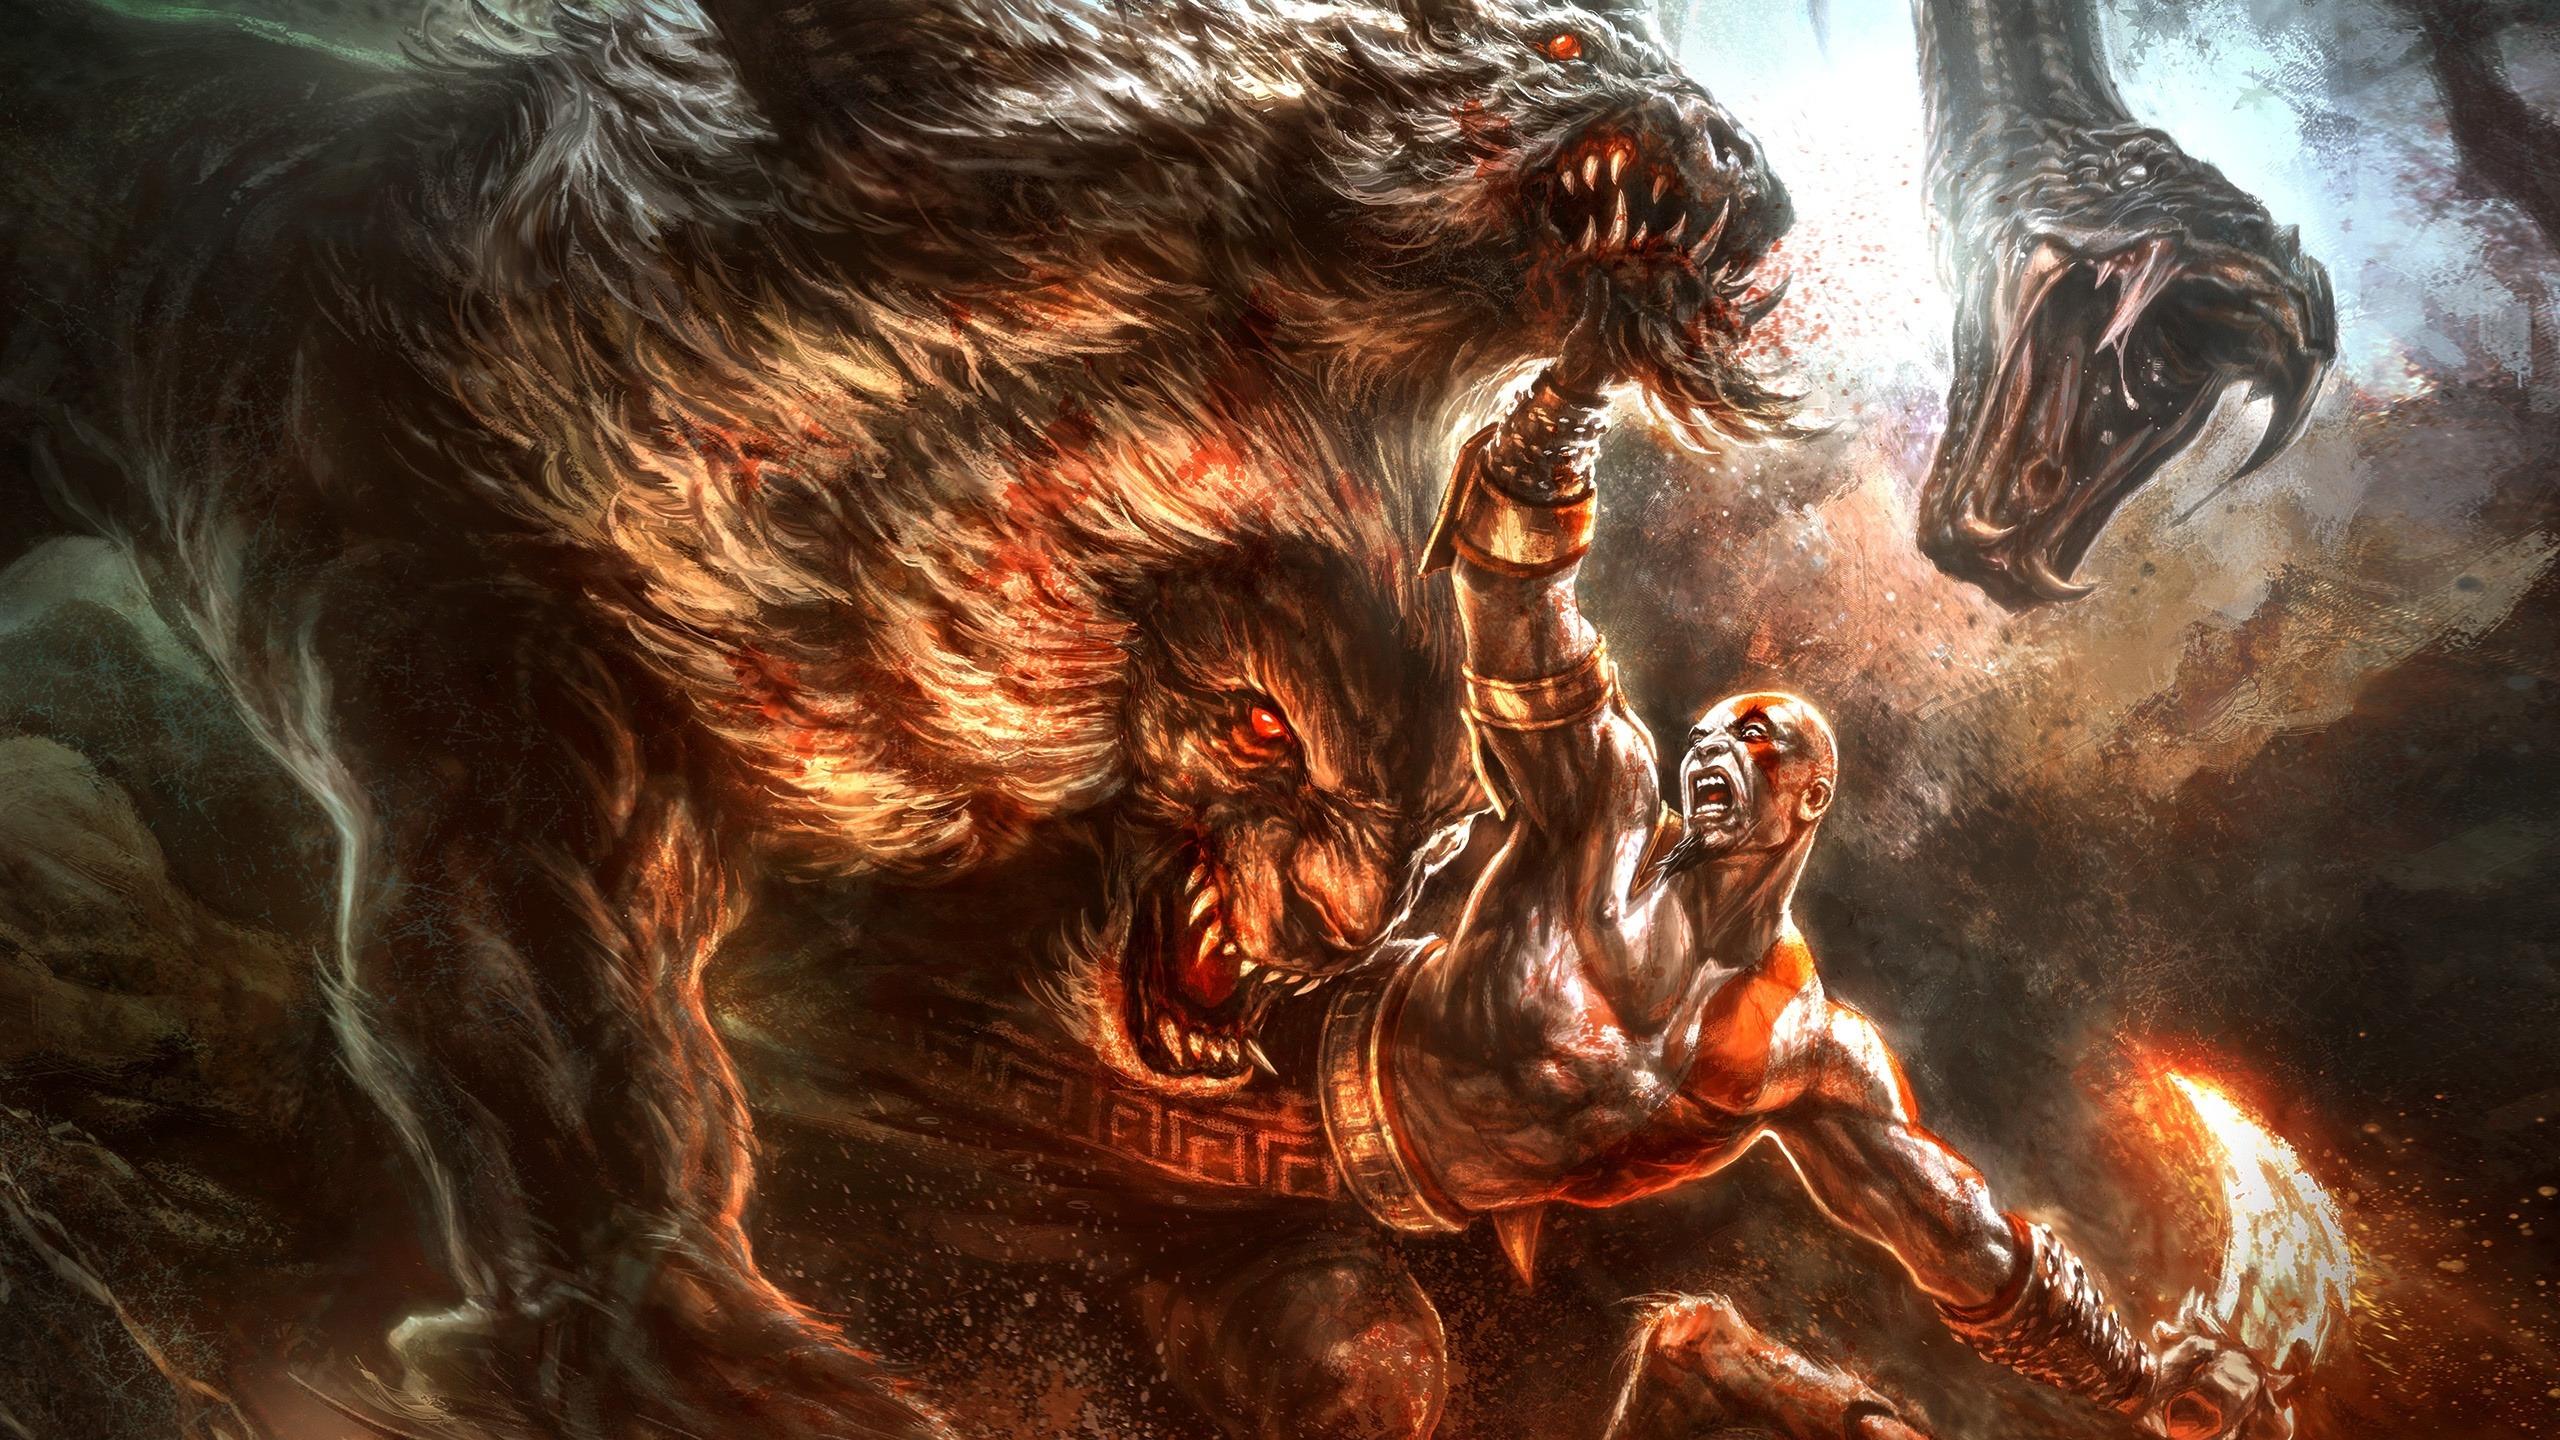 Download Wallpaper Kratos God Of War 3 Animal Gods